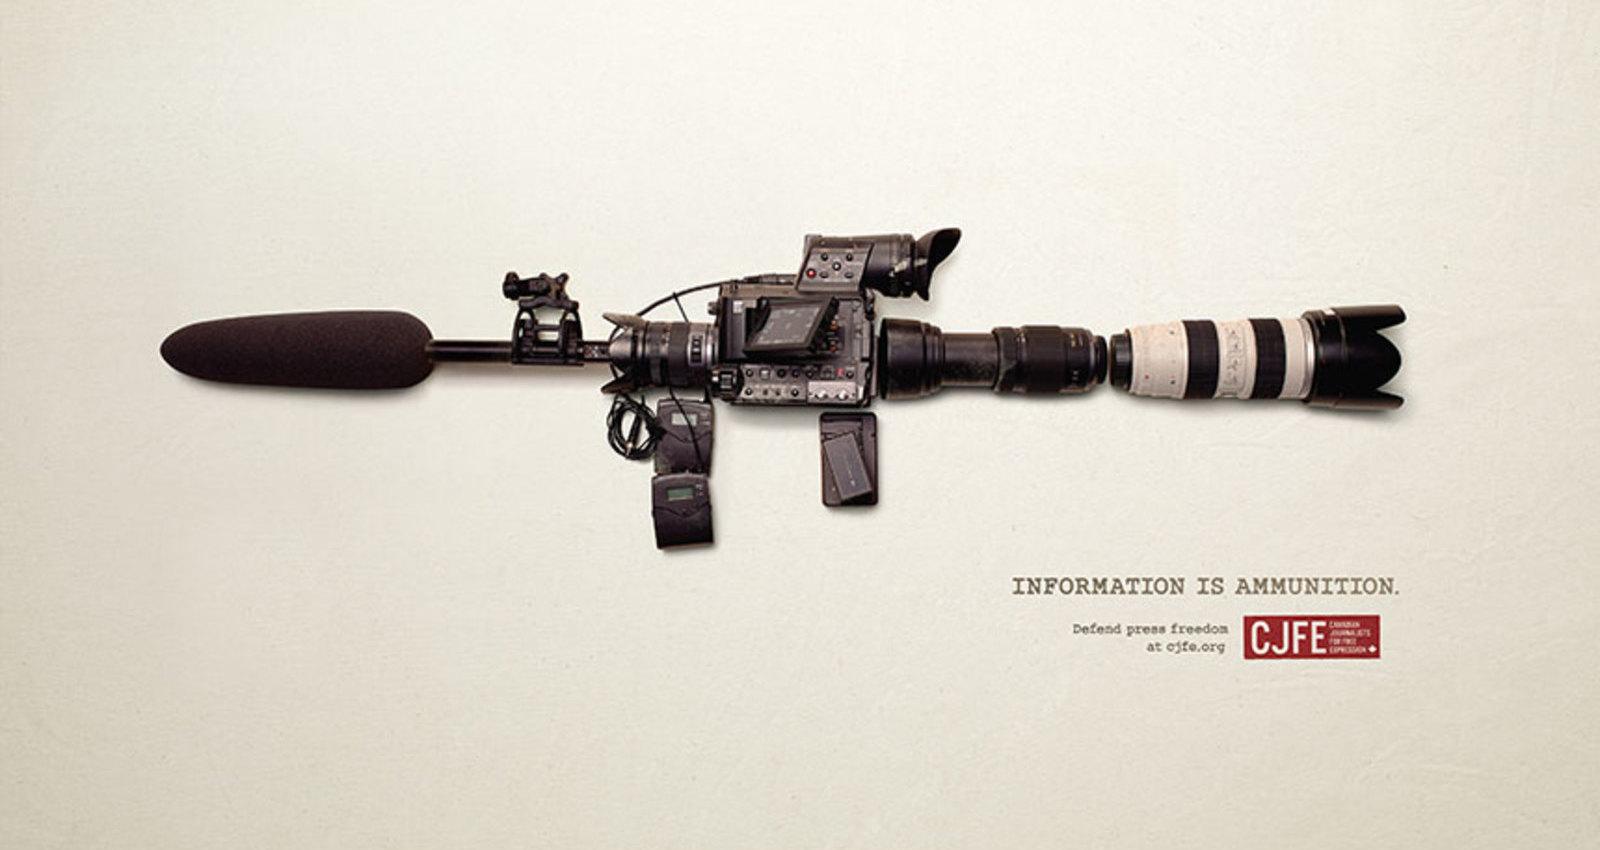 Information is Ammunition